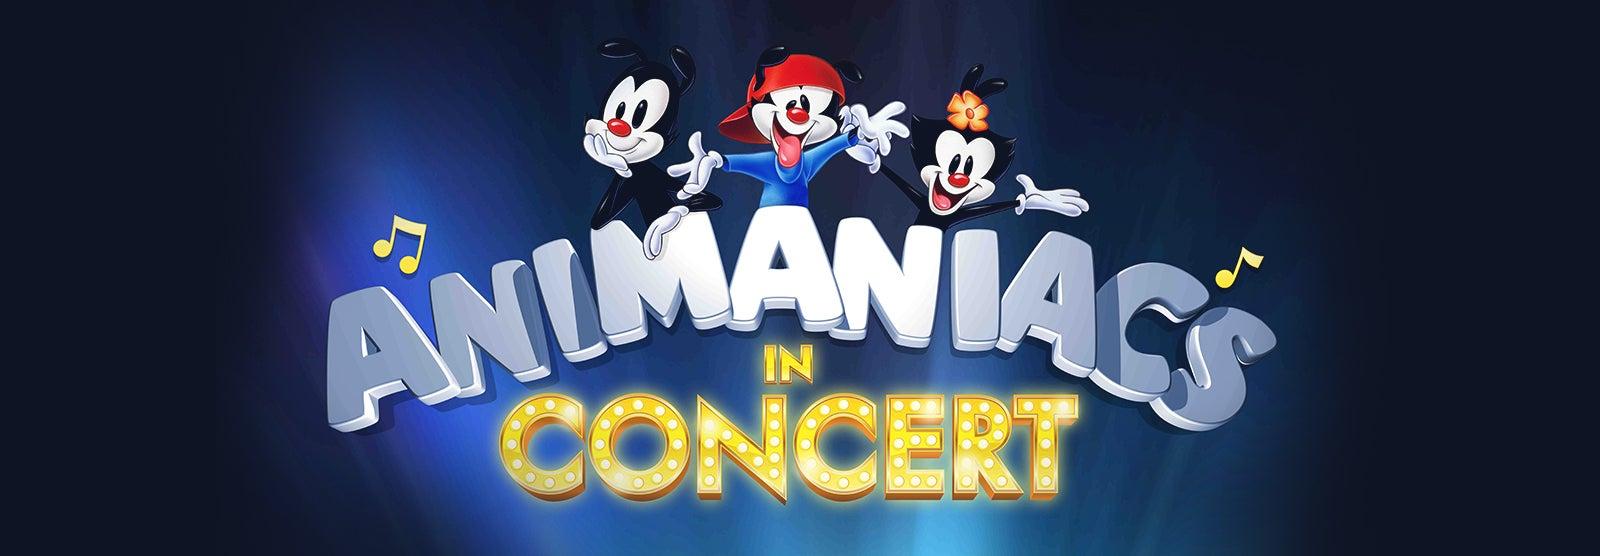 Animaniacs - In Concert